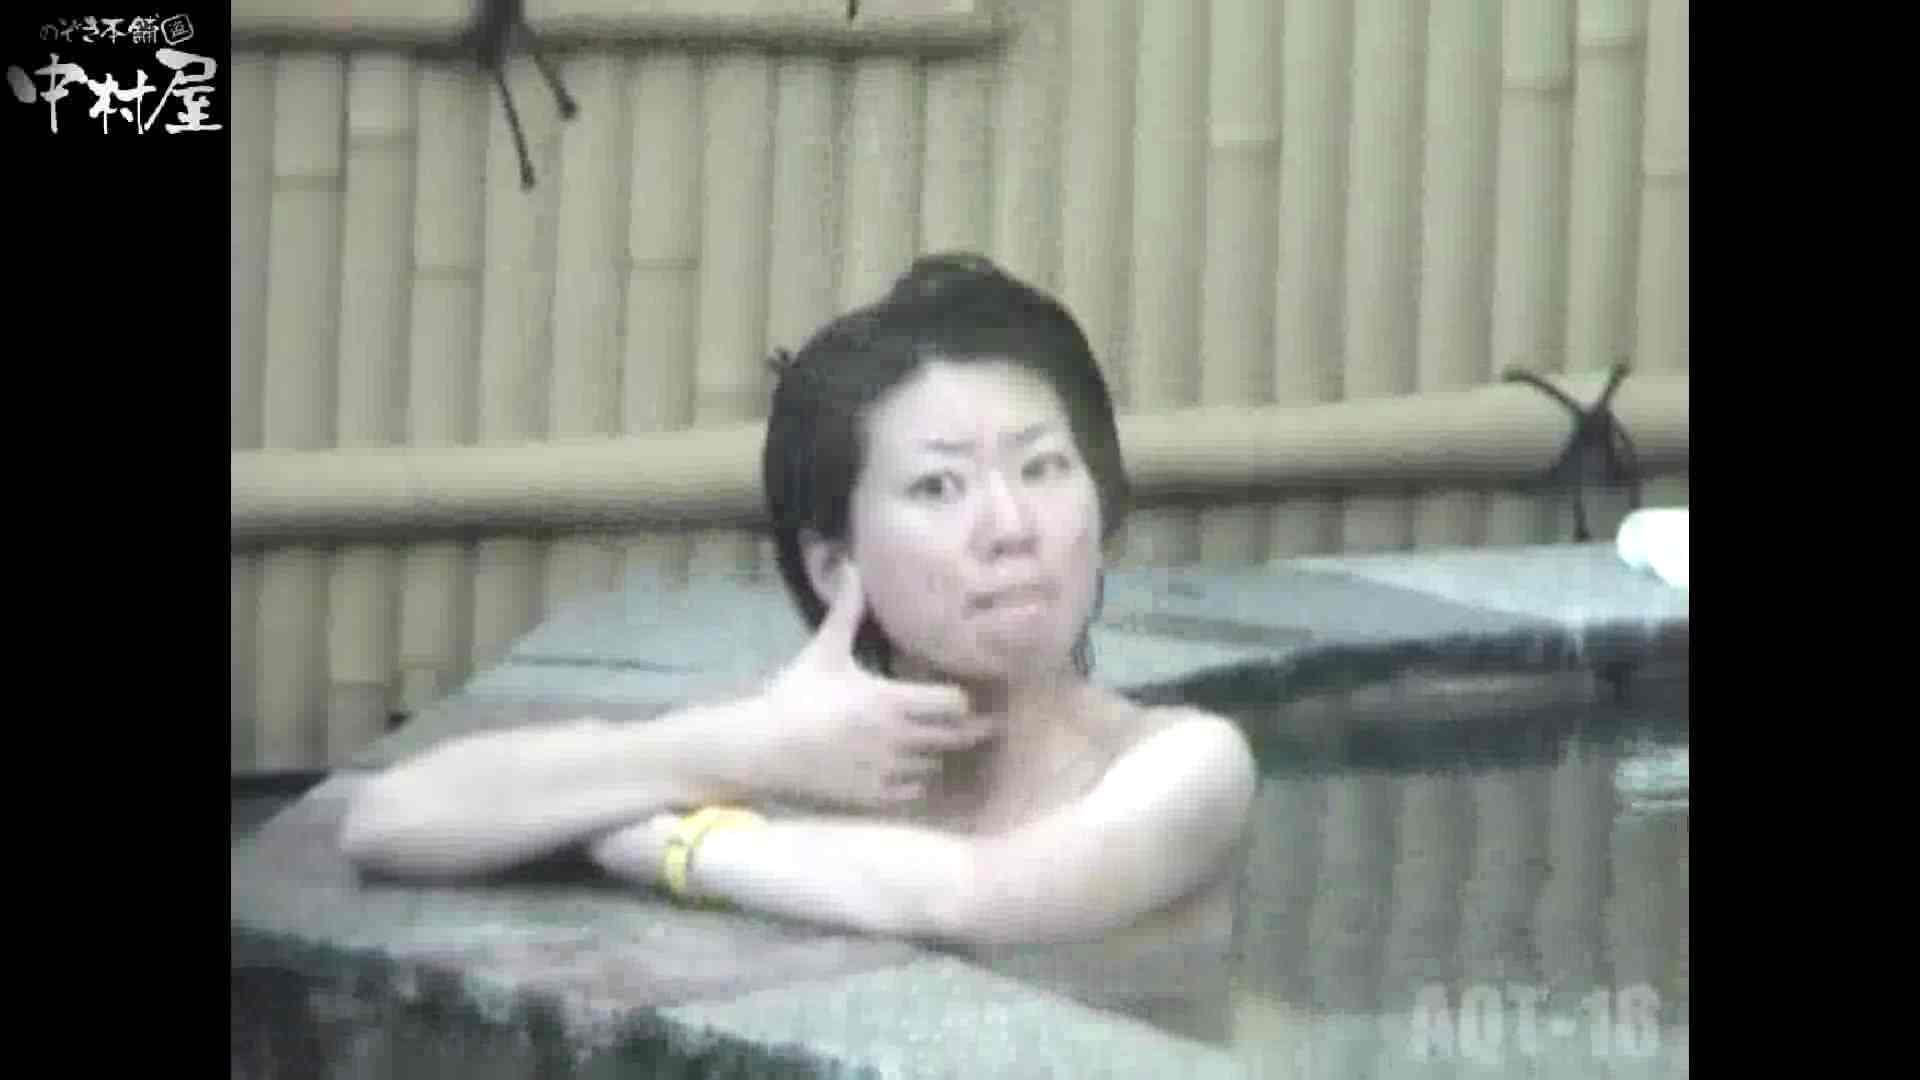 Aquaな露天風呂Vol.880潜入盗撮露天風呂十六判湯 其の三 盗撮師作品 | 美しいOLの裸体  100pic 13